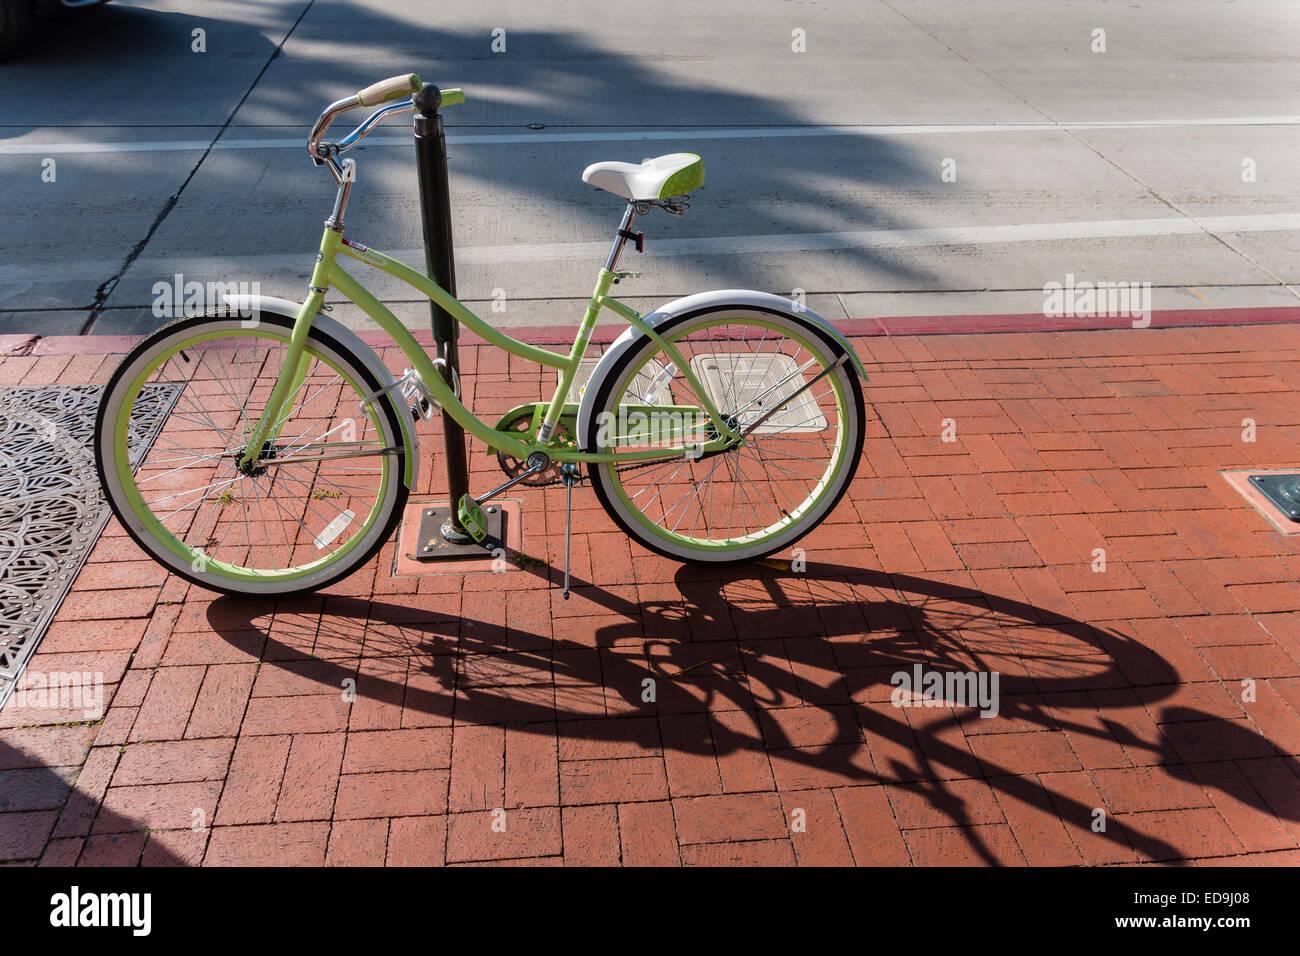 https www alamy com stock photo a beach cruiser bicycle at a bike rack on a brick sidewalk on state 77043688 html